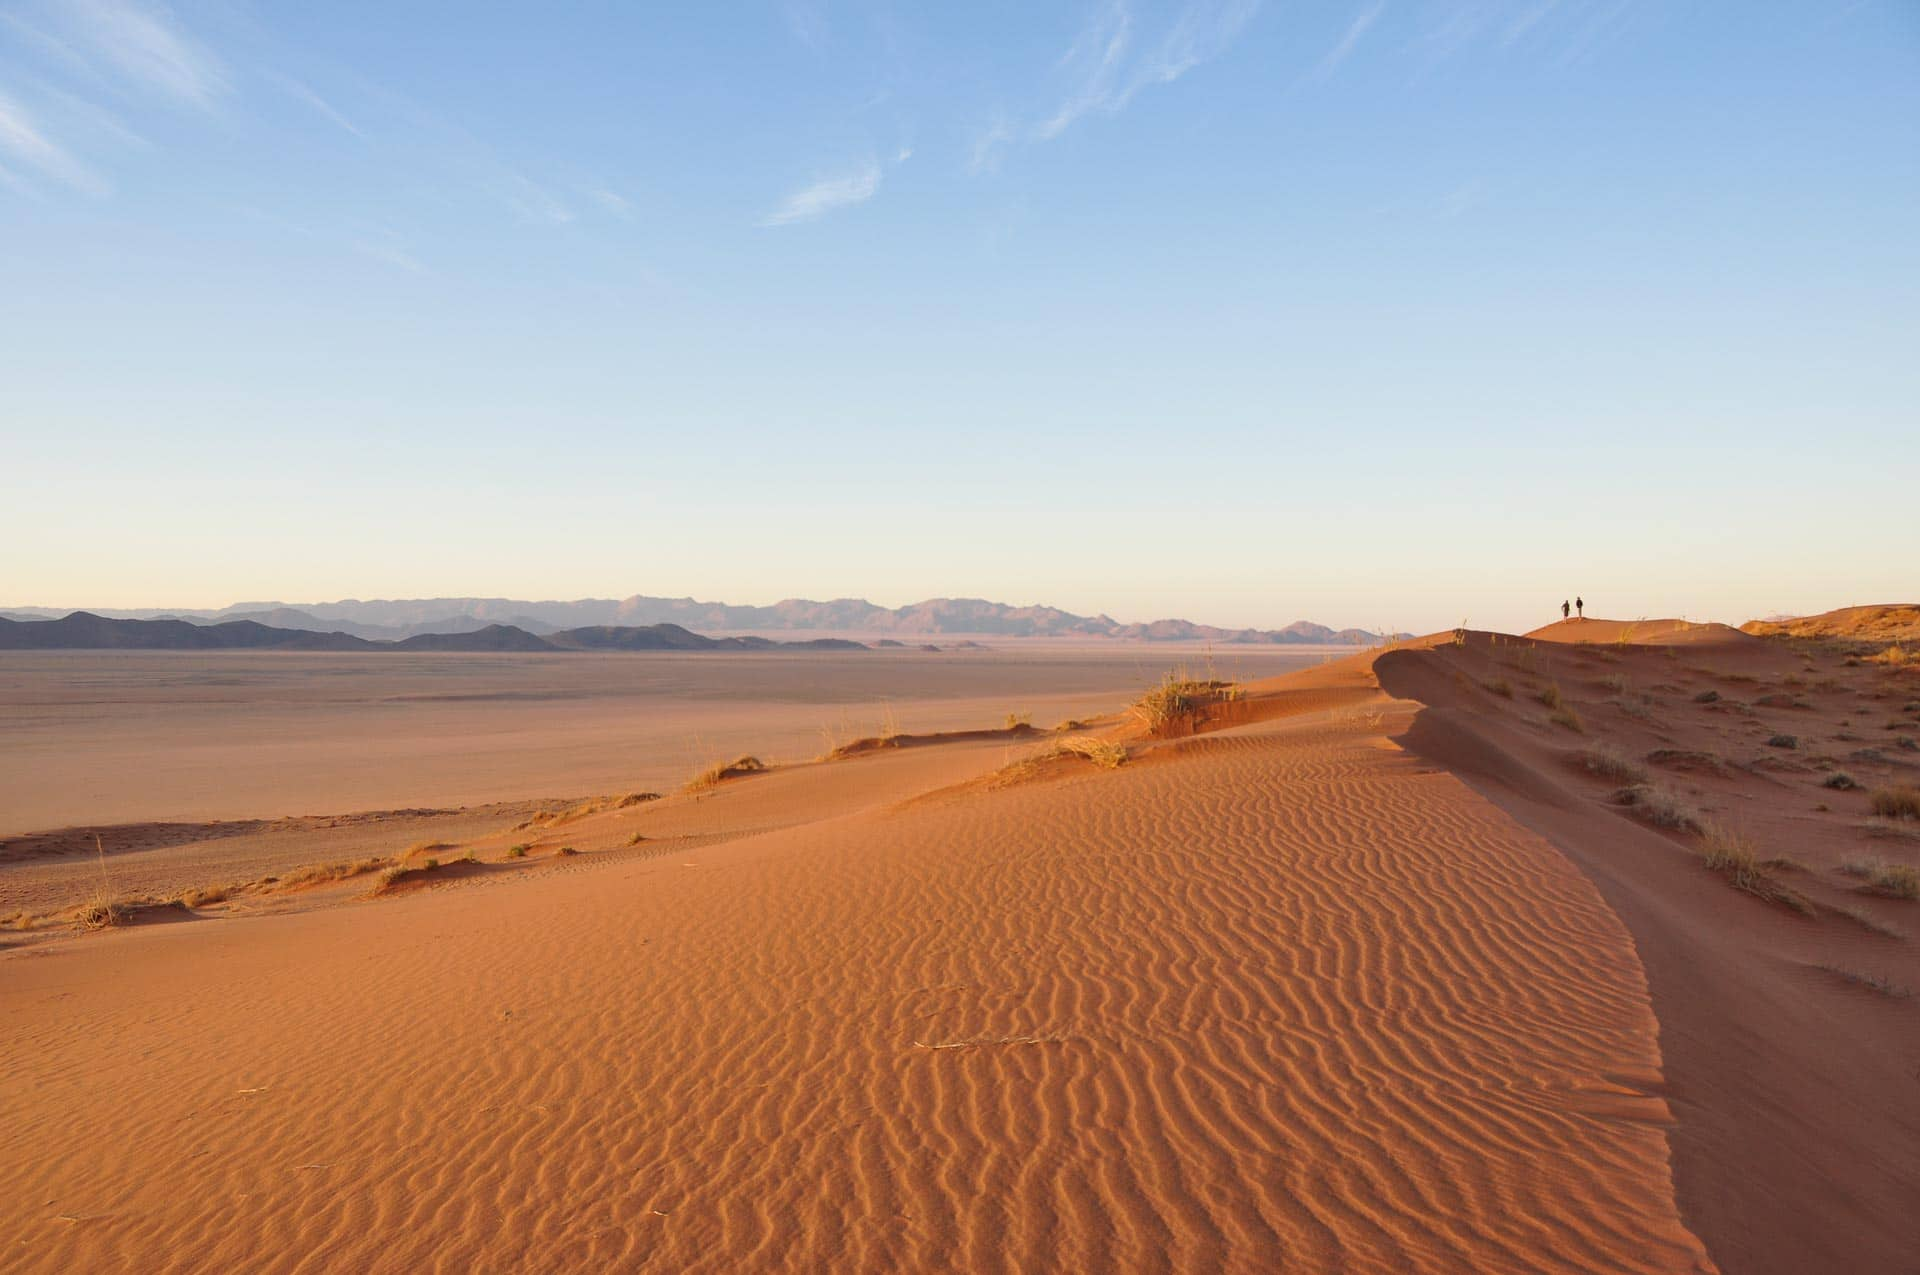 Kanaan-Desert-Retreat-Namibia-Globetrotter-Select-36